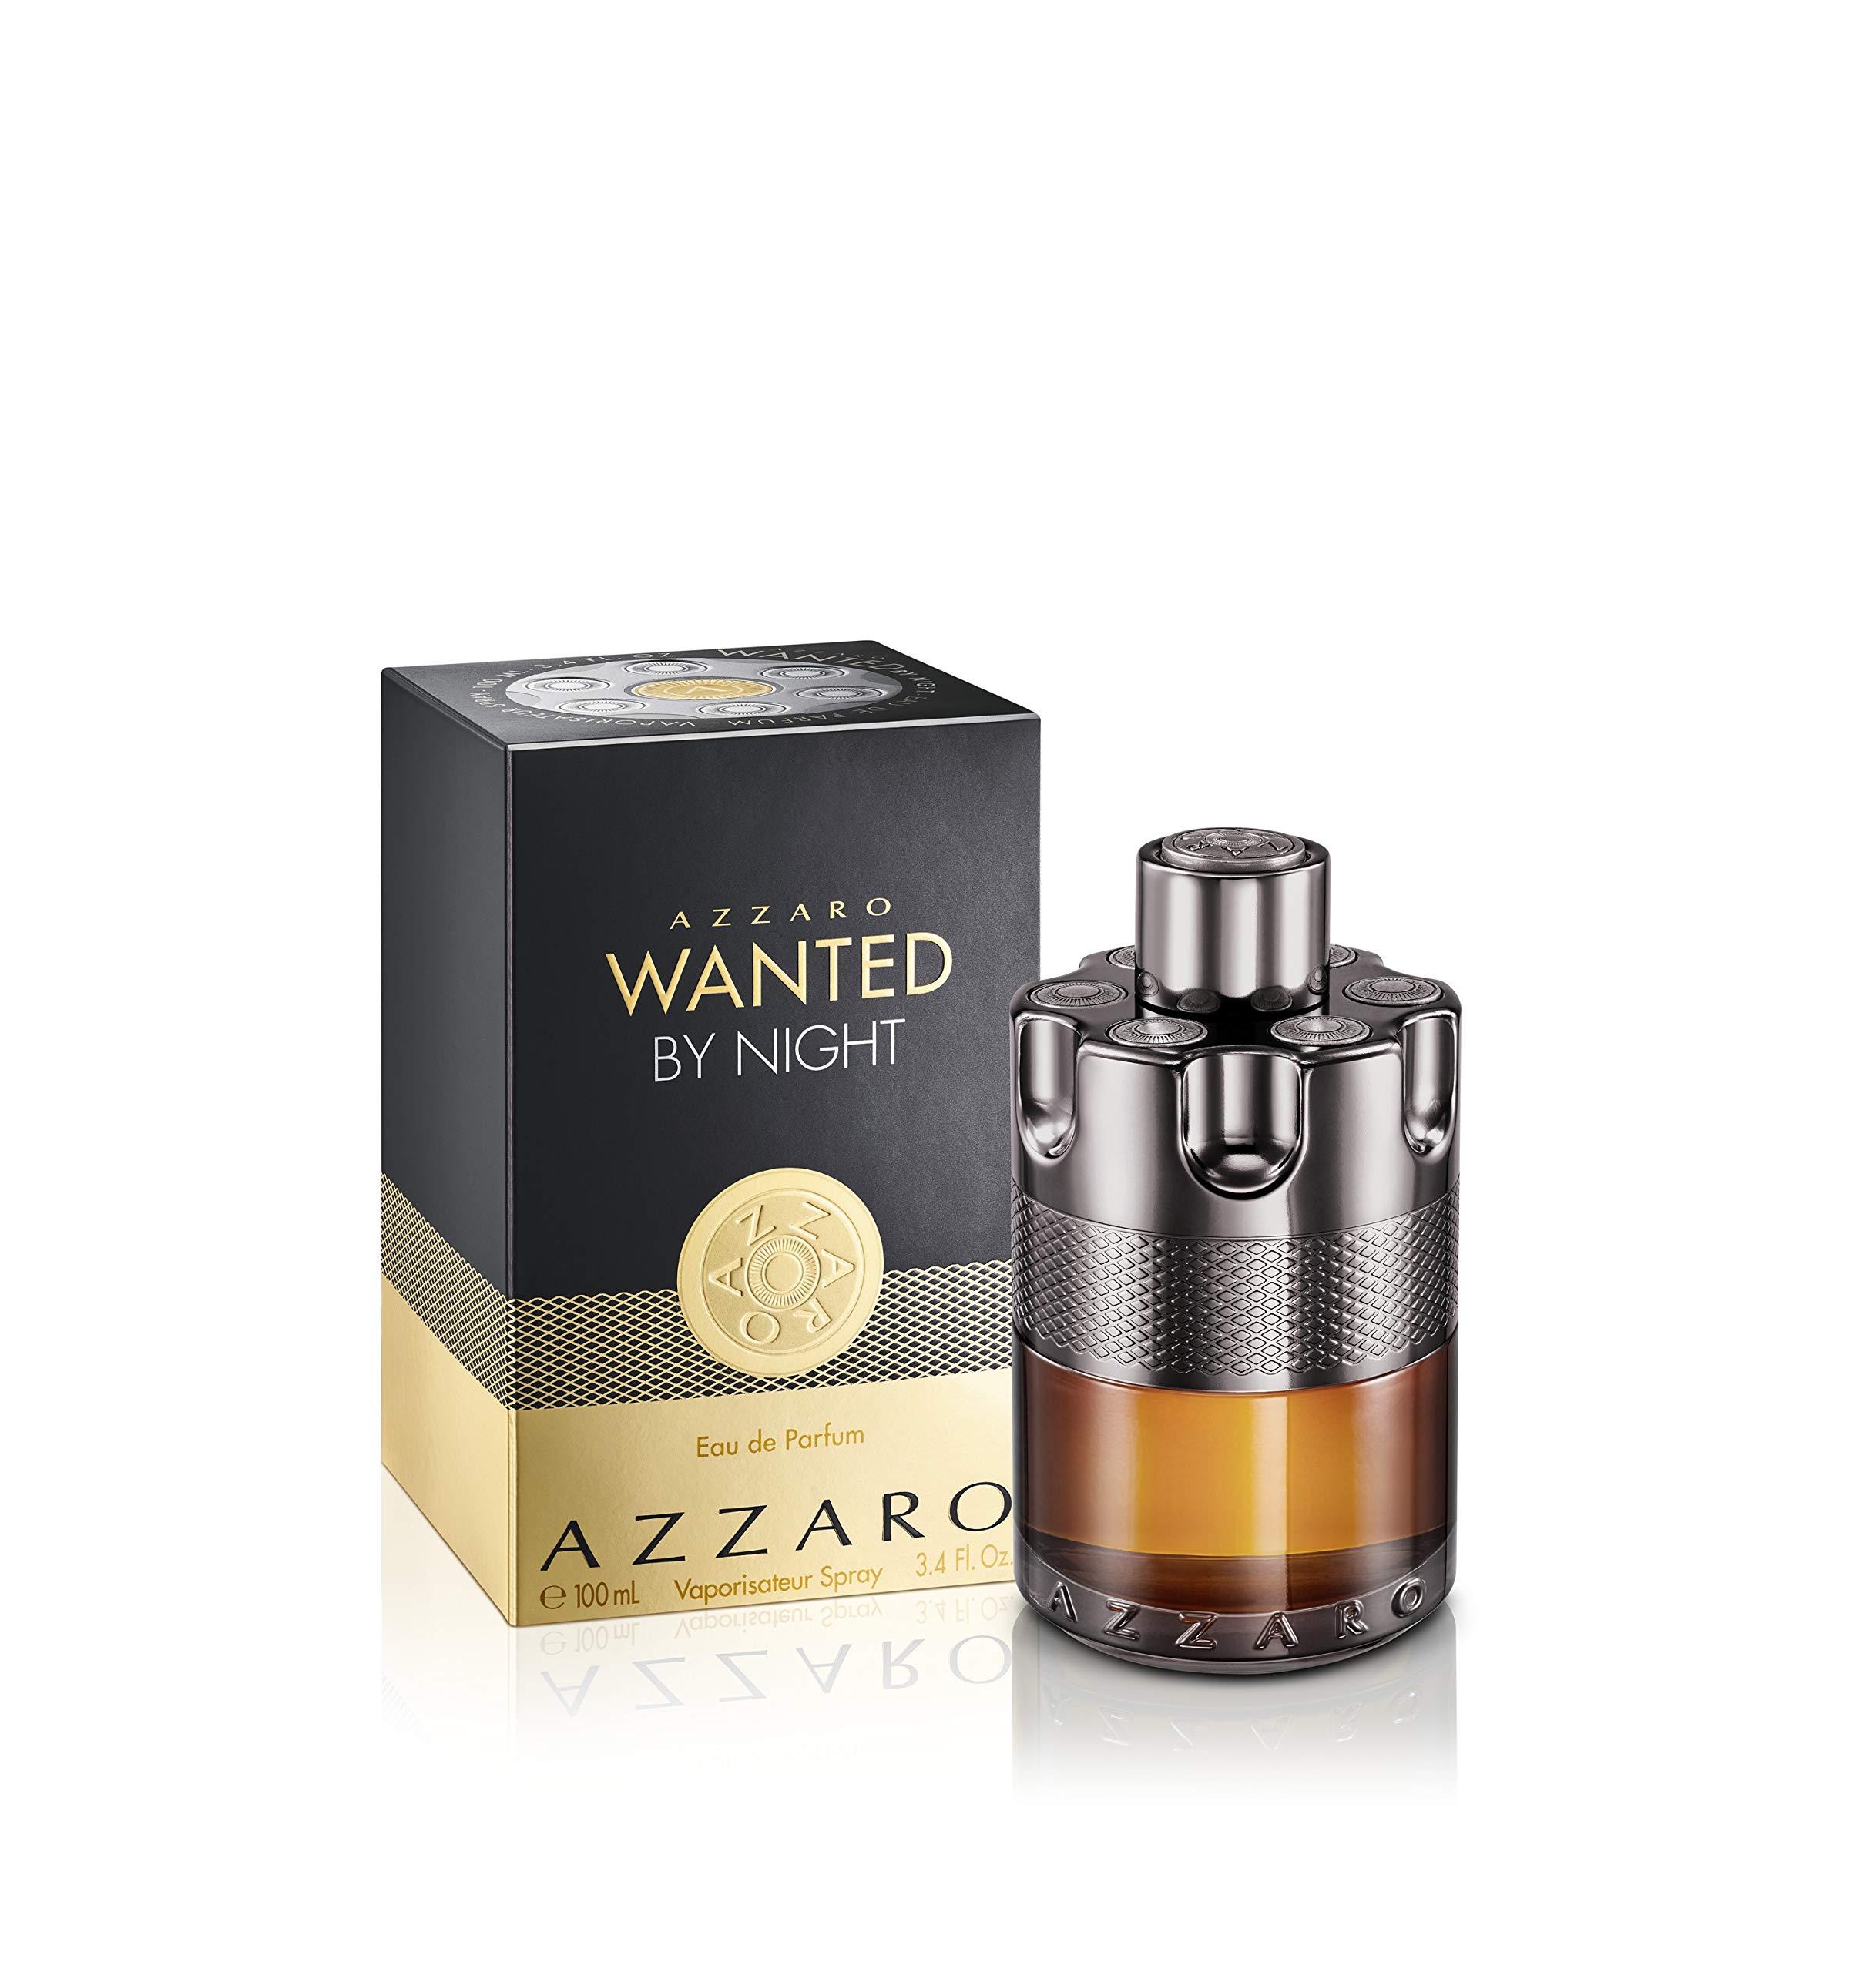 Azzaro Wanted by Night Eau de Parfum for Men - Mens Cologne